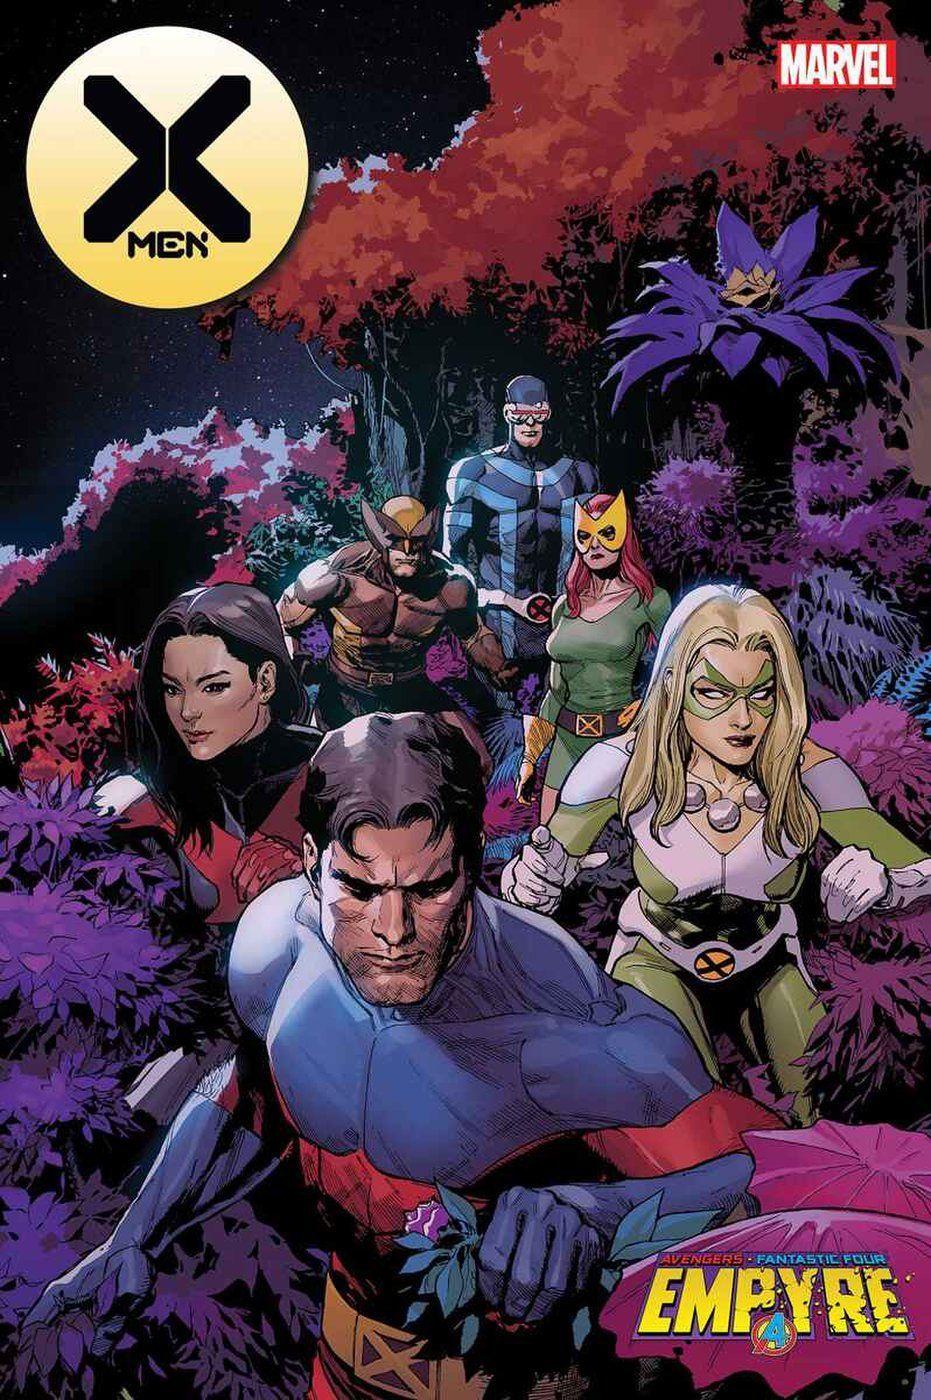 House Of Magnus X Men 12 2020 By Jonathan Hickman Leinil In 2020 Xmen Comics Comics X Men